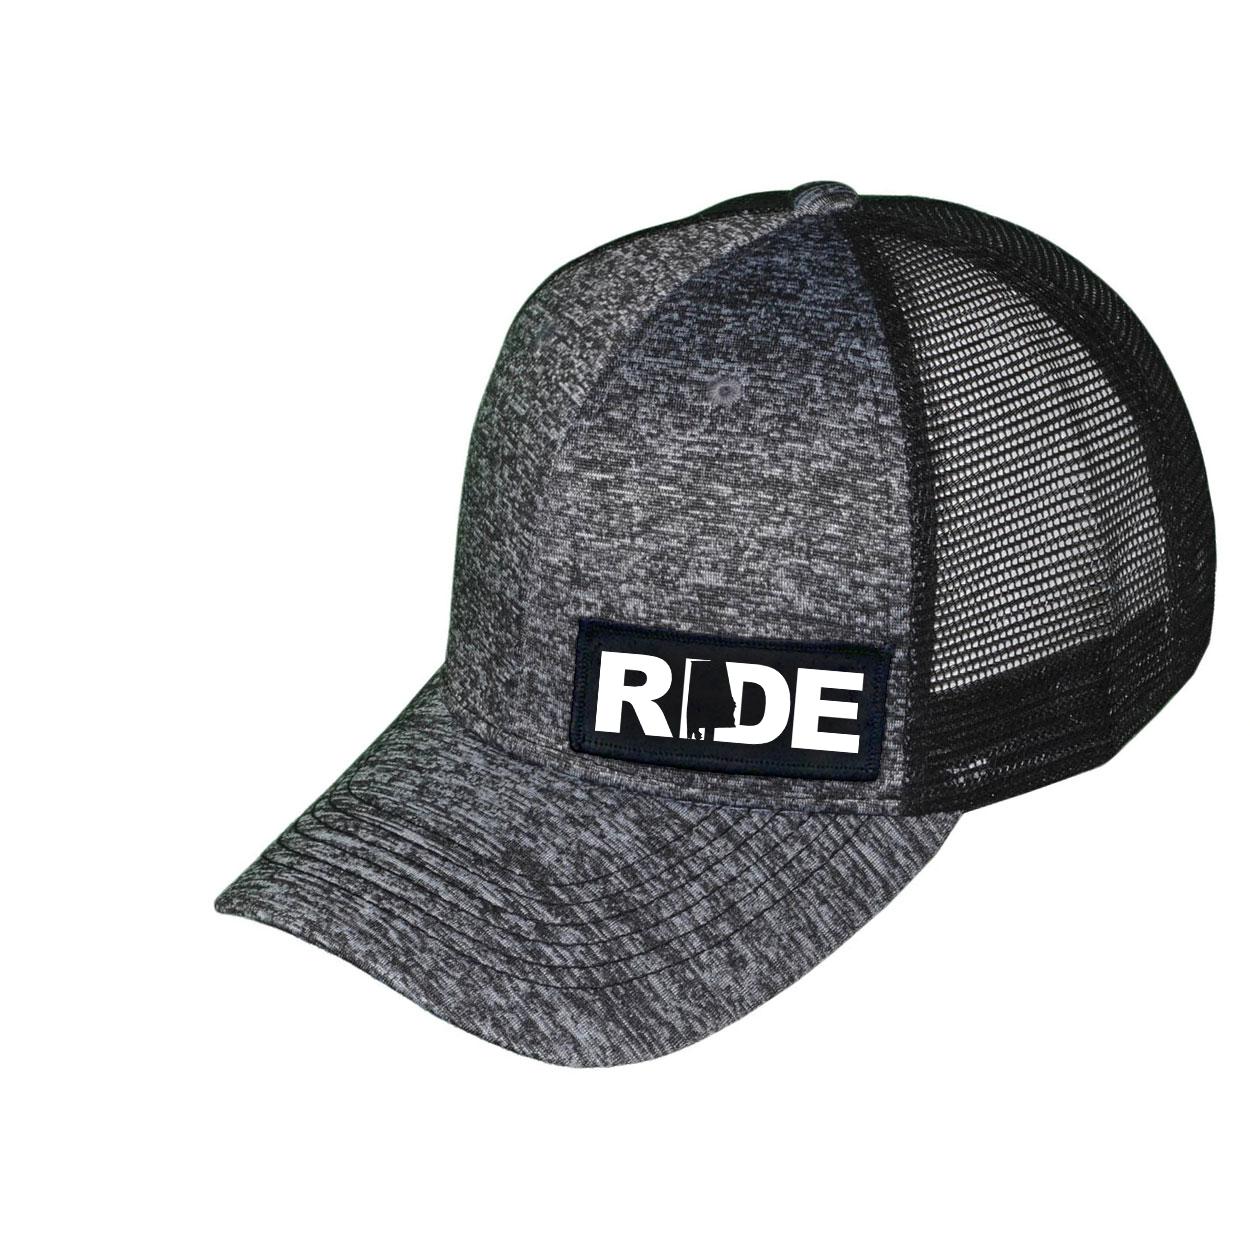 Ride Alabama Night Out Woven Patch Melange Snapback Trucker Hat Gray/Black (White Logo)